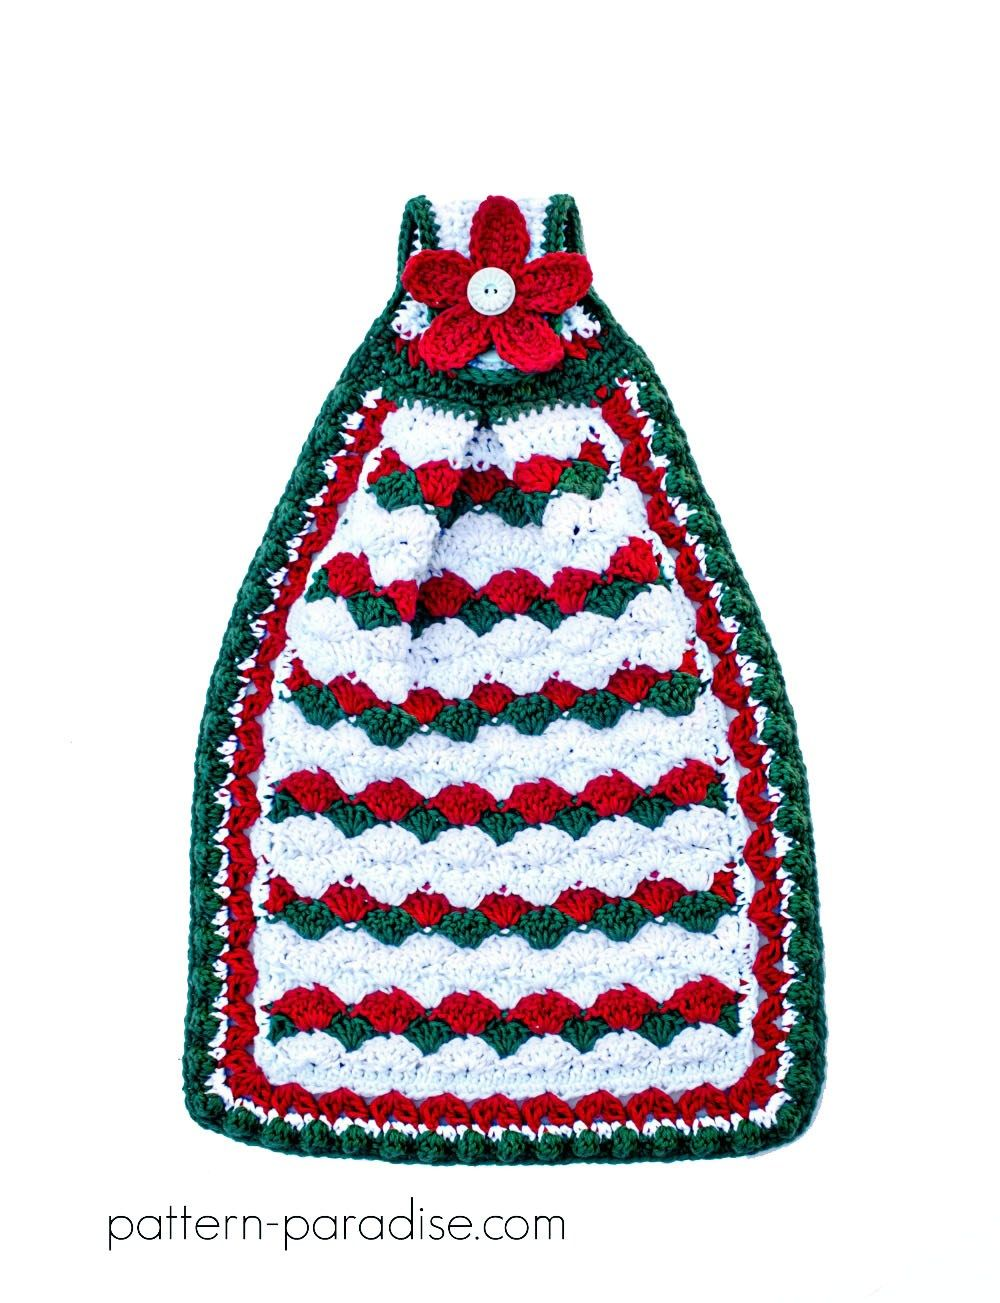 Free Crochet Pattern: Holiday Helper Dish Towel | Pattern Paradise ...